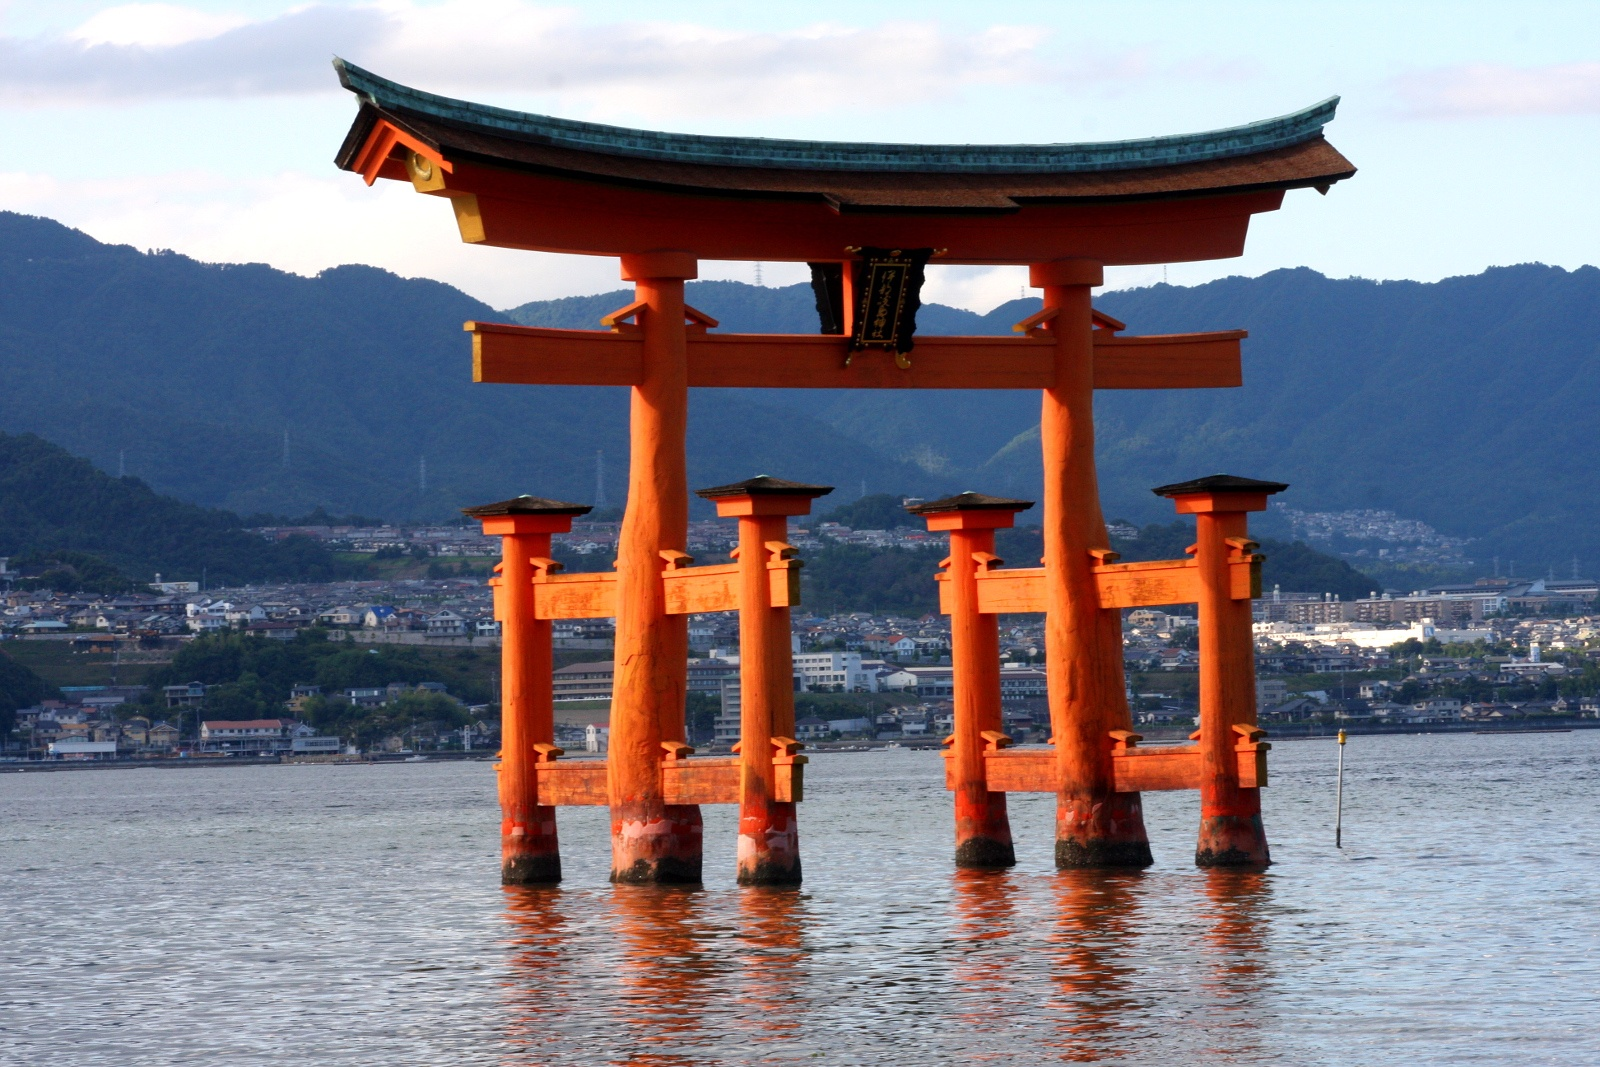 Pływająca brama torii (floating torii gate), światynia Itsukushima-jinja (Miyajima), pref. Hiroshima / Hiroshima